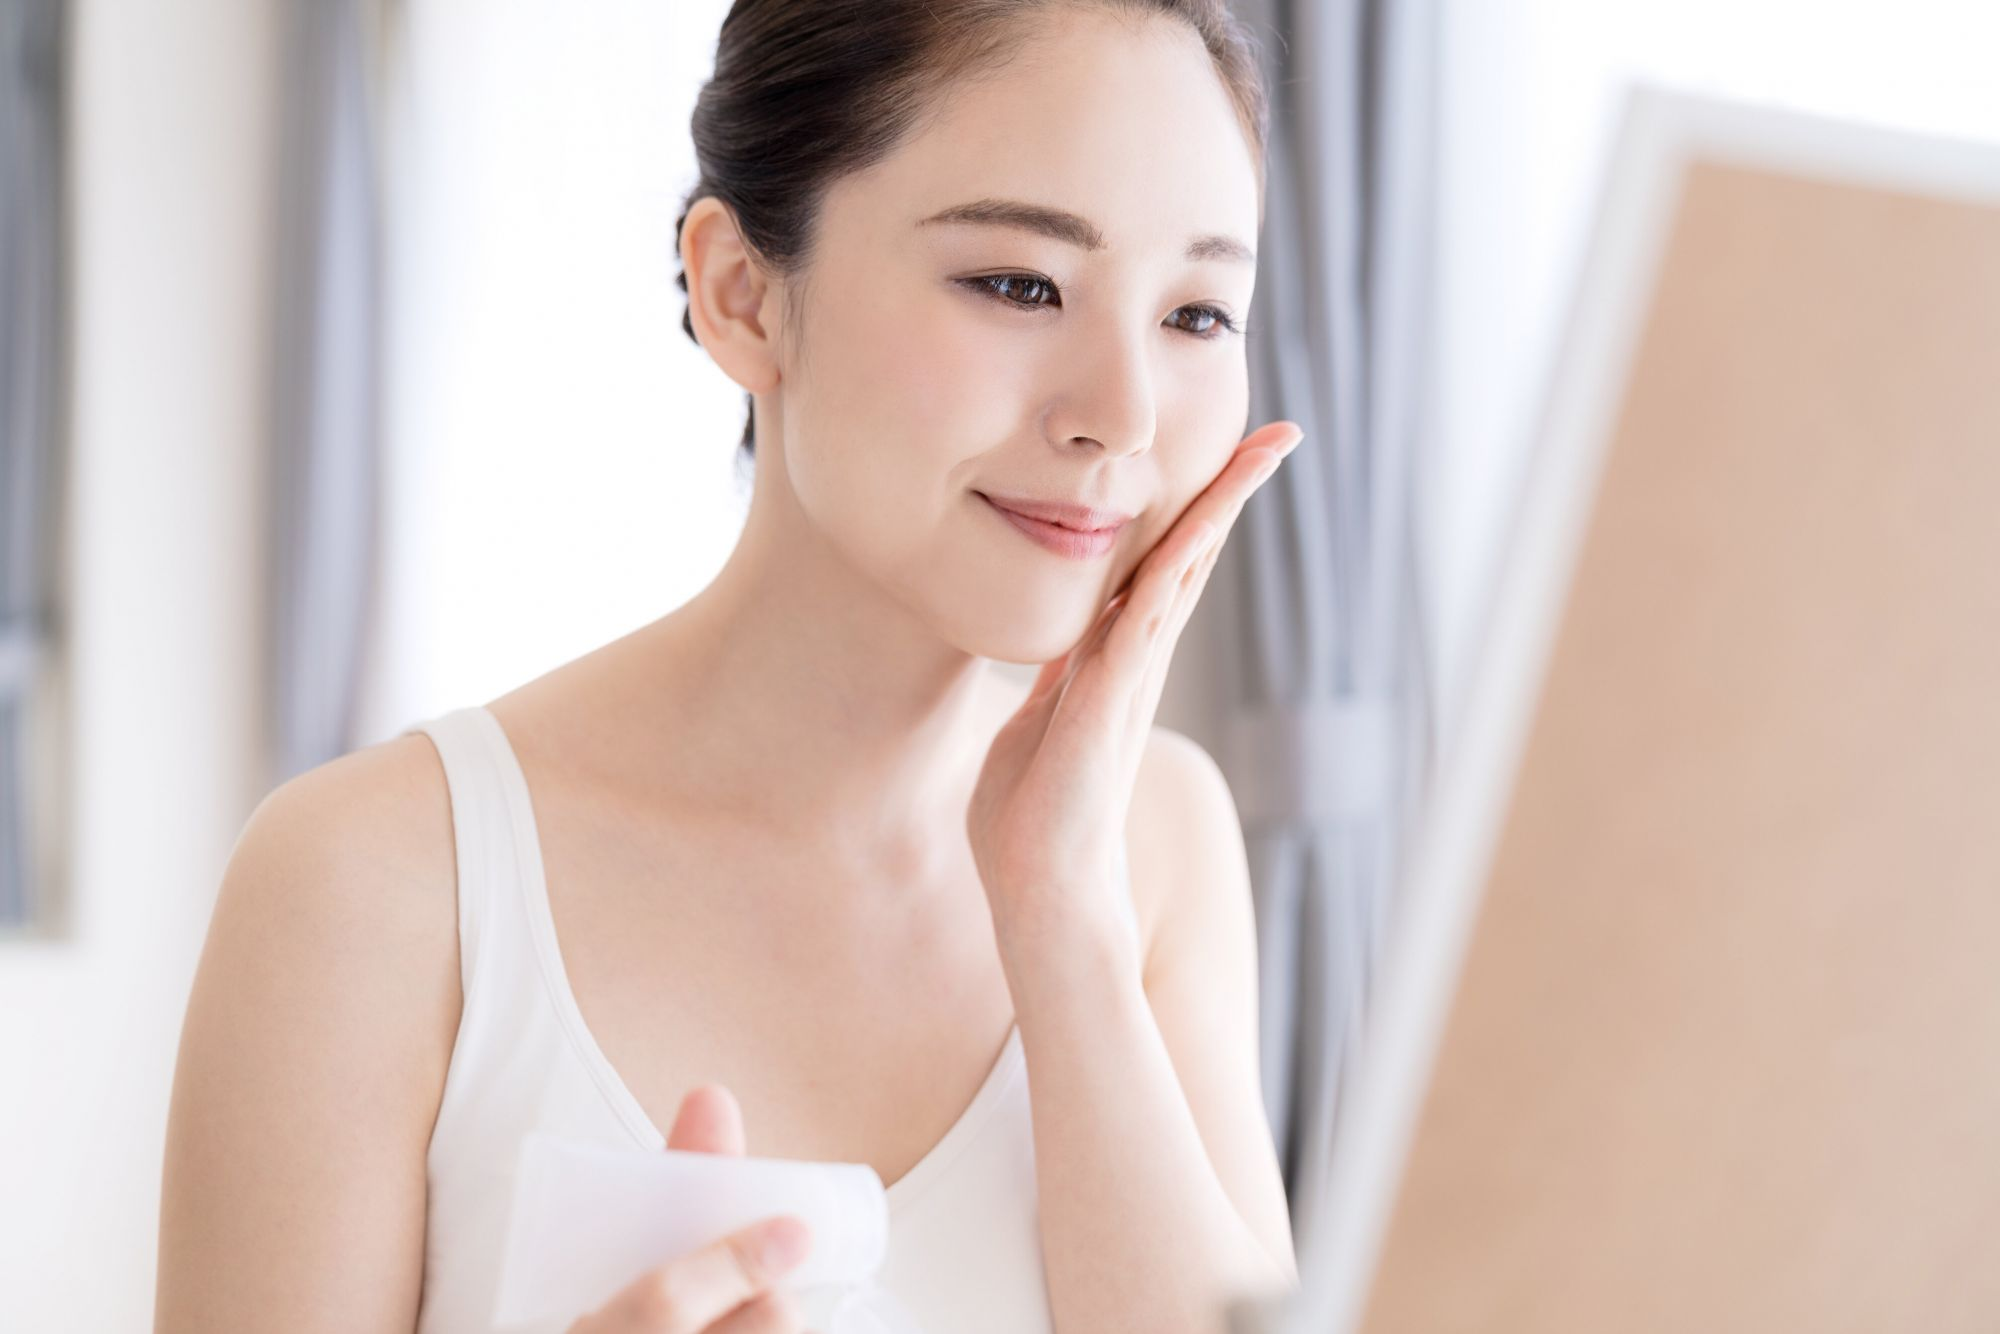 acne prone skincare - dermatologist tips - best treatment for acne